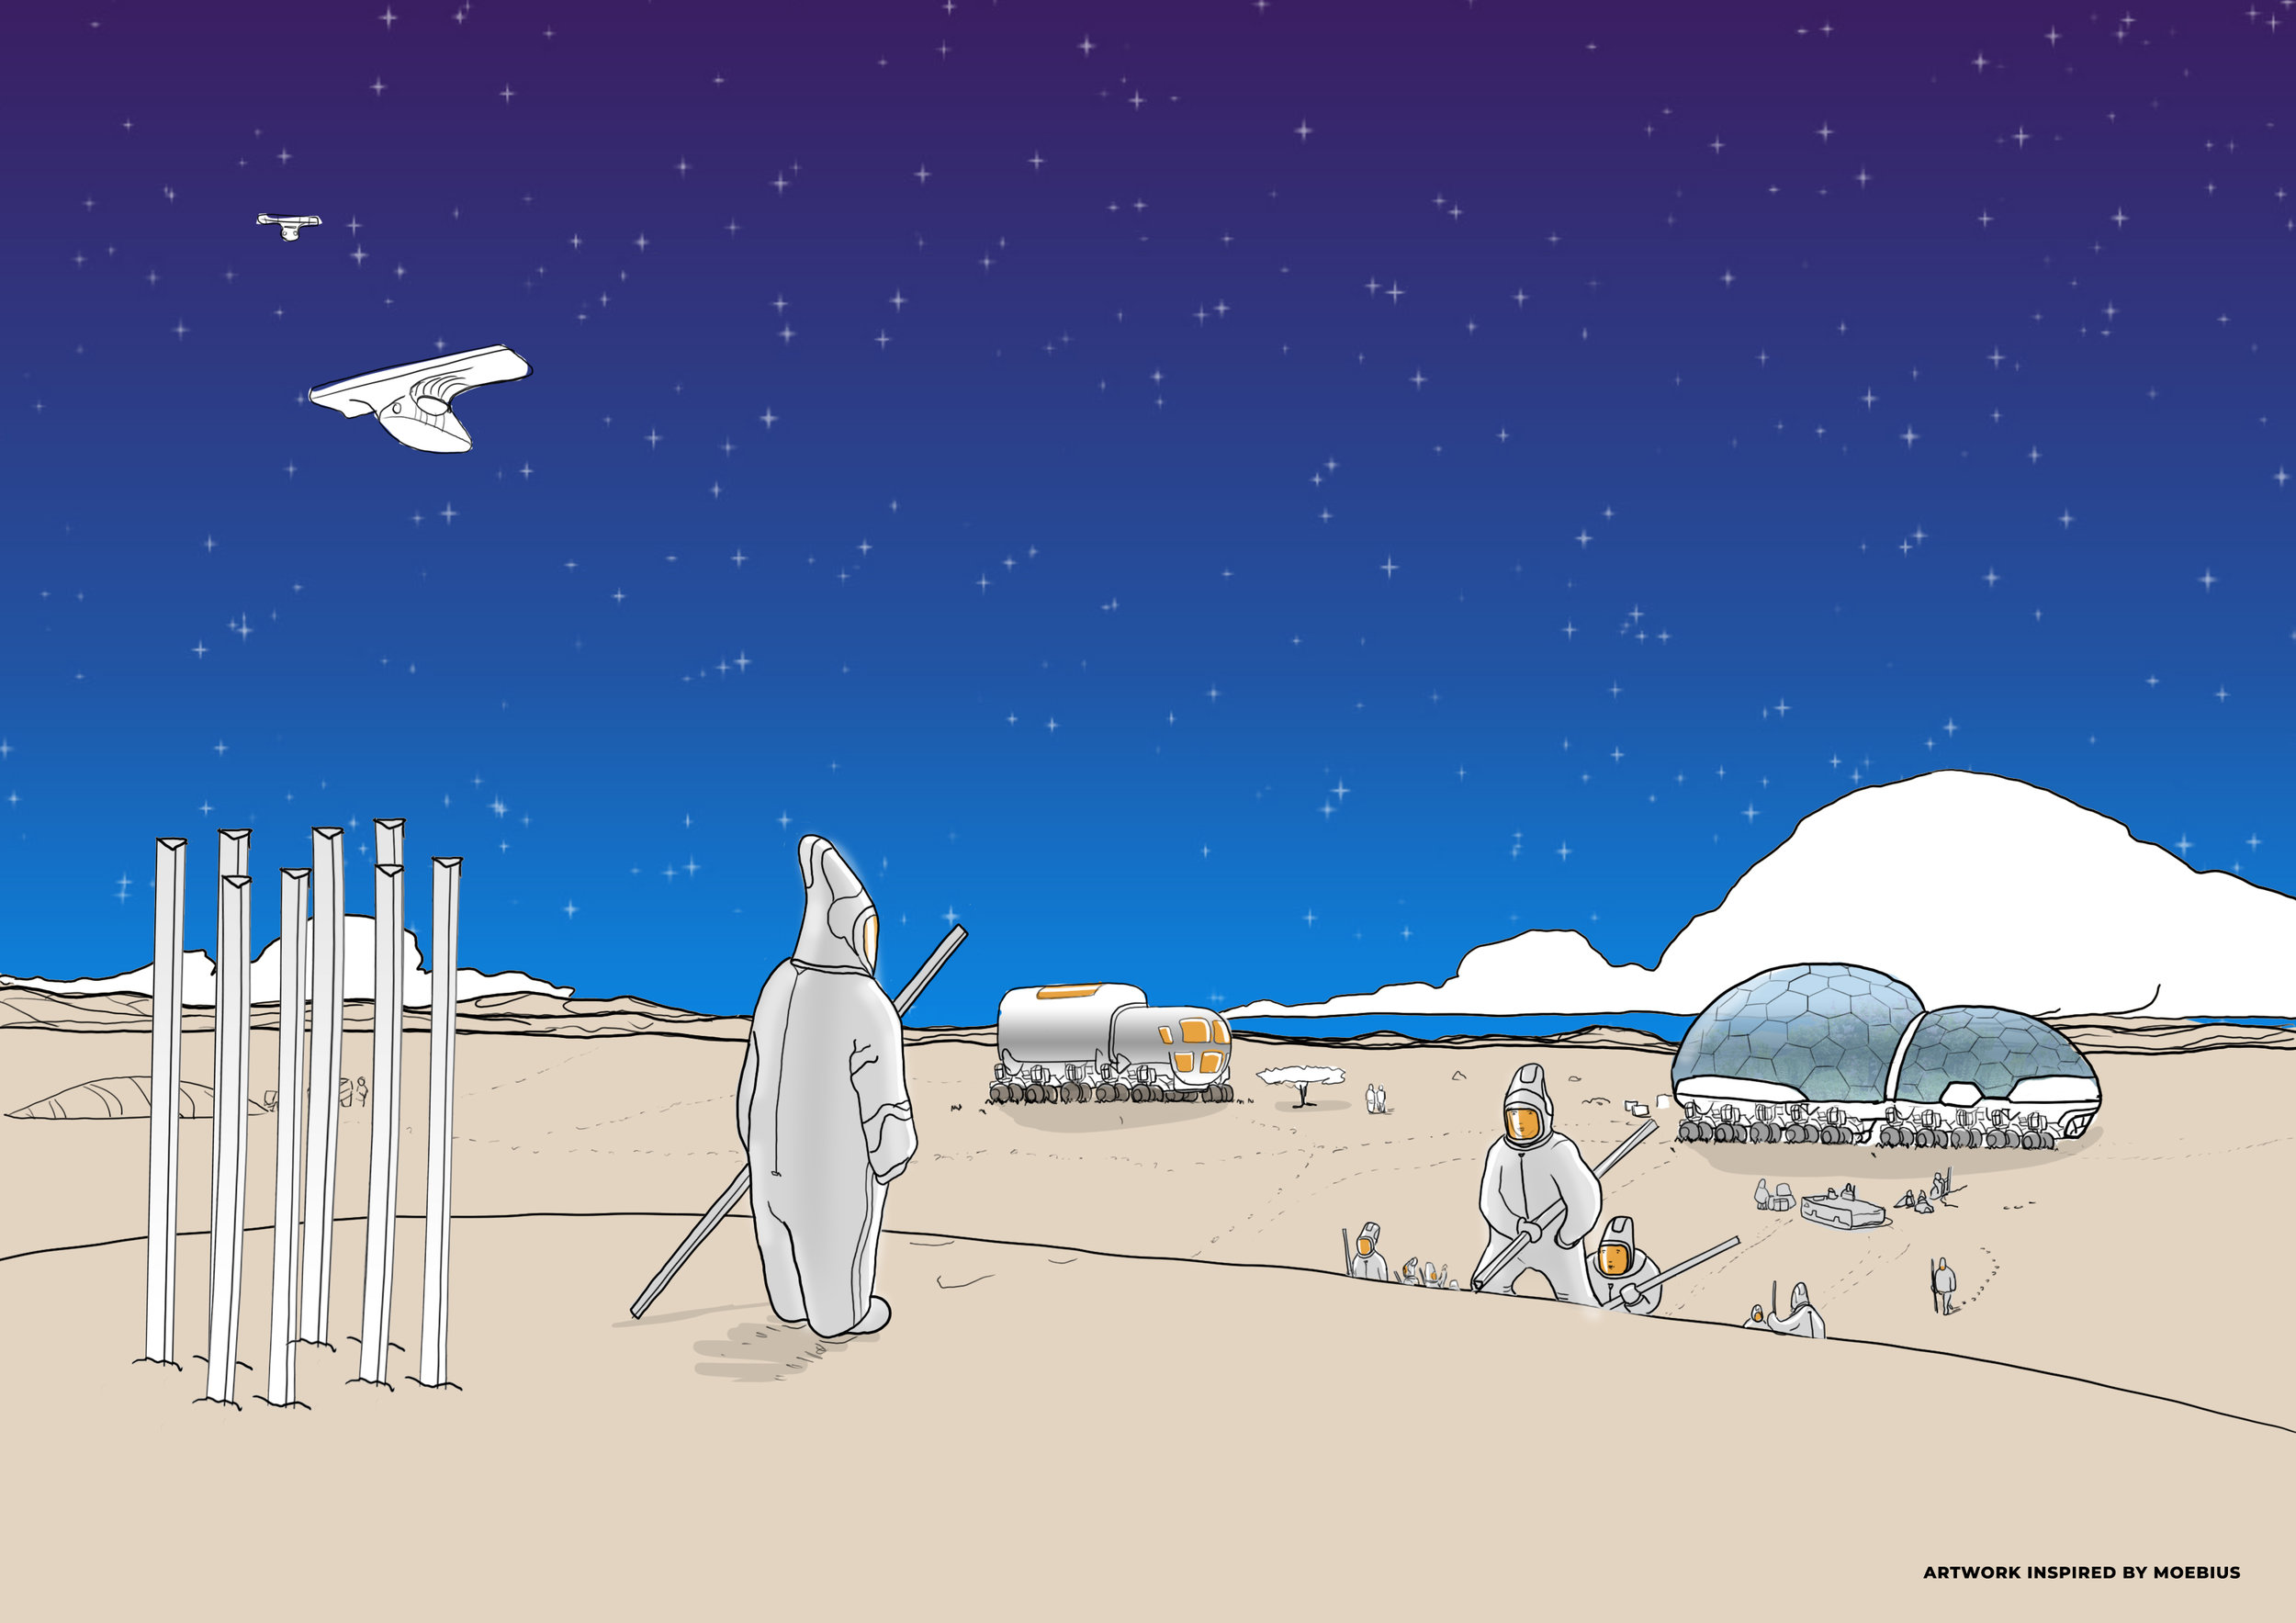 Illustration made by: Jomy Joseph